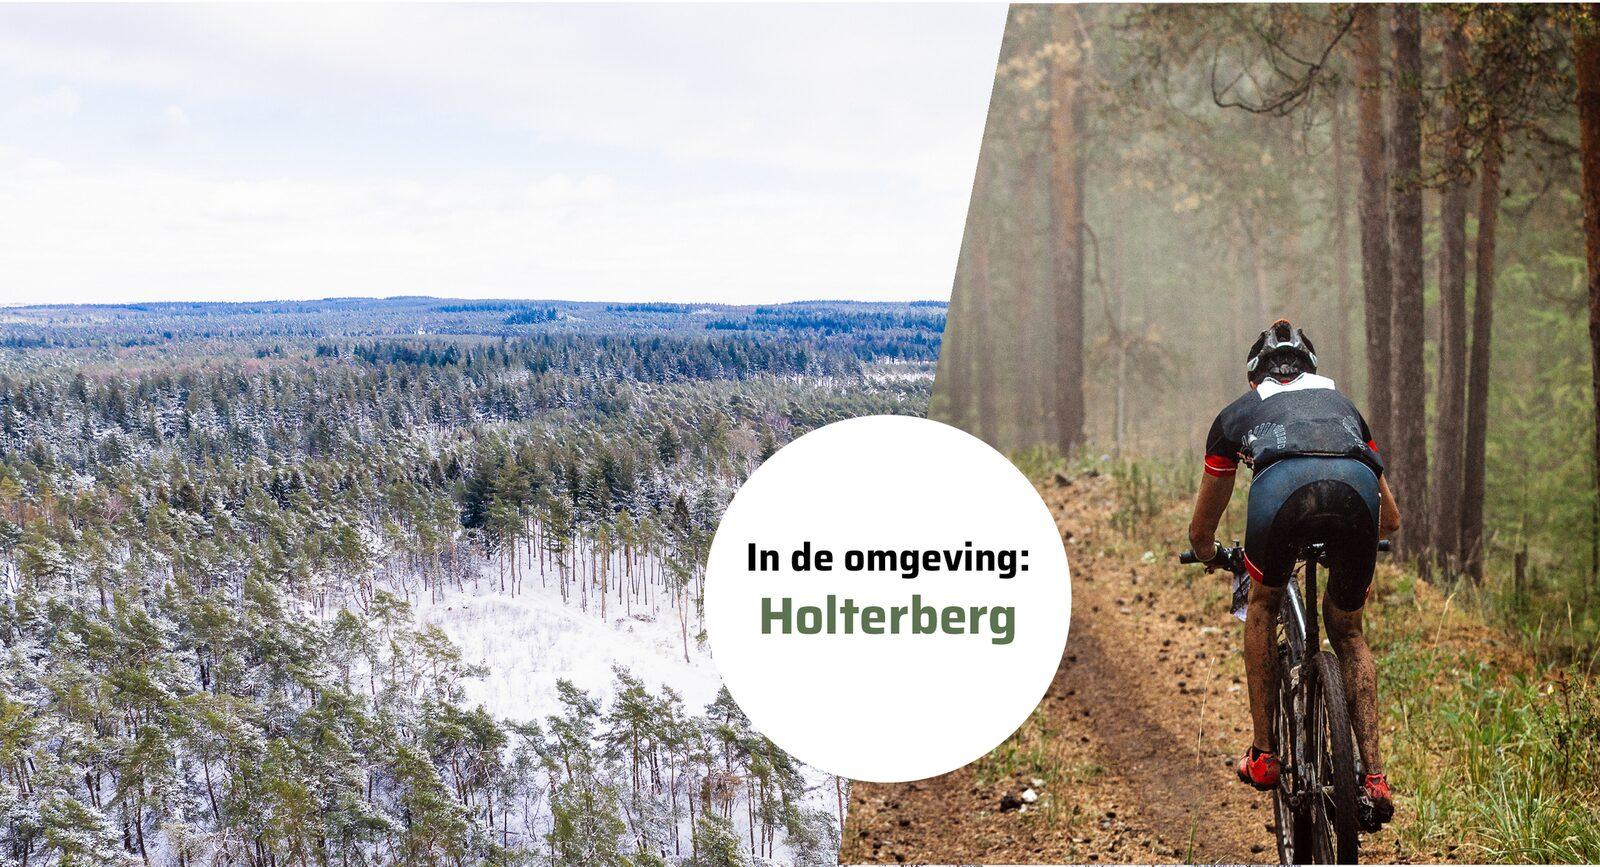 Safaritent a/d Holterberg met Privé Sanitair | 6 pers.